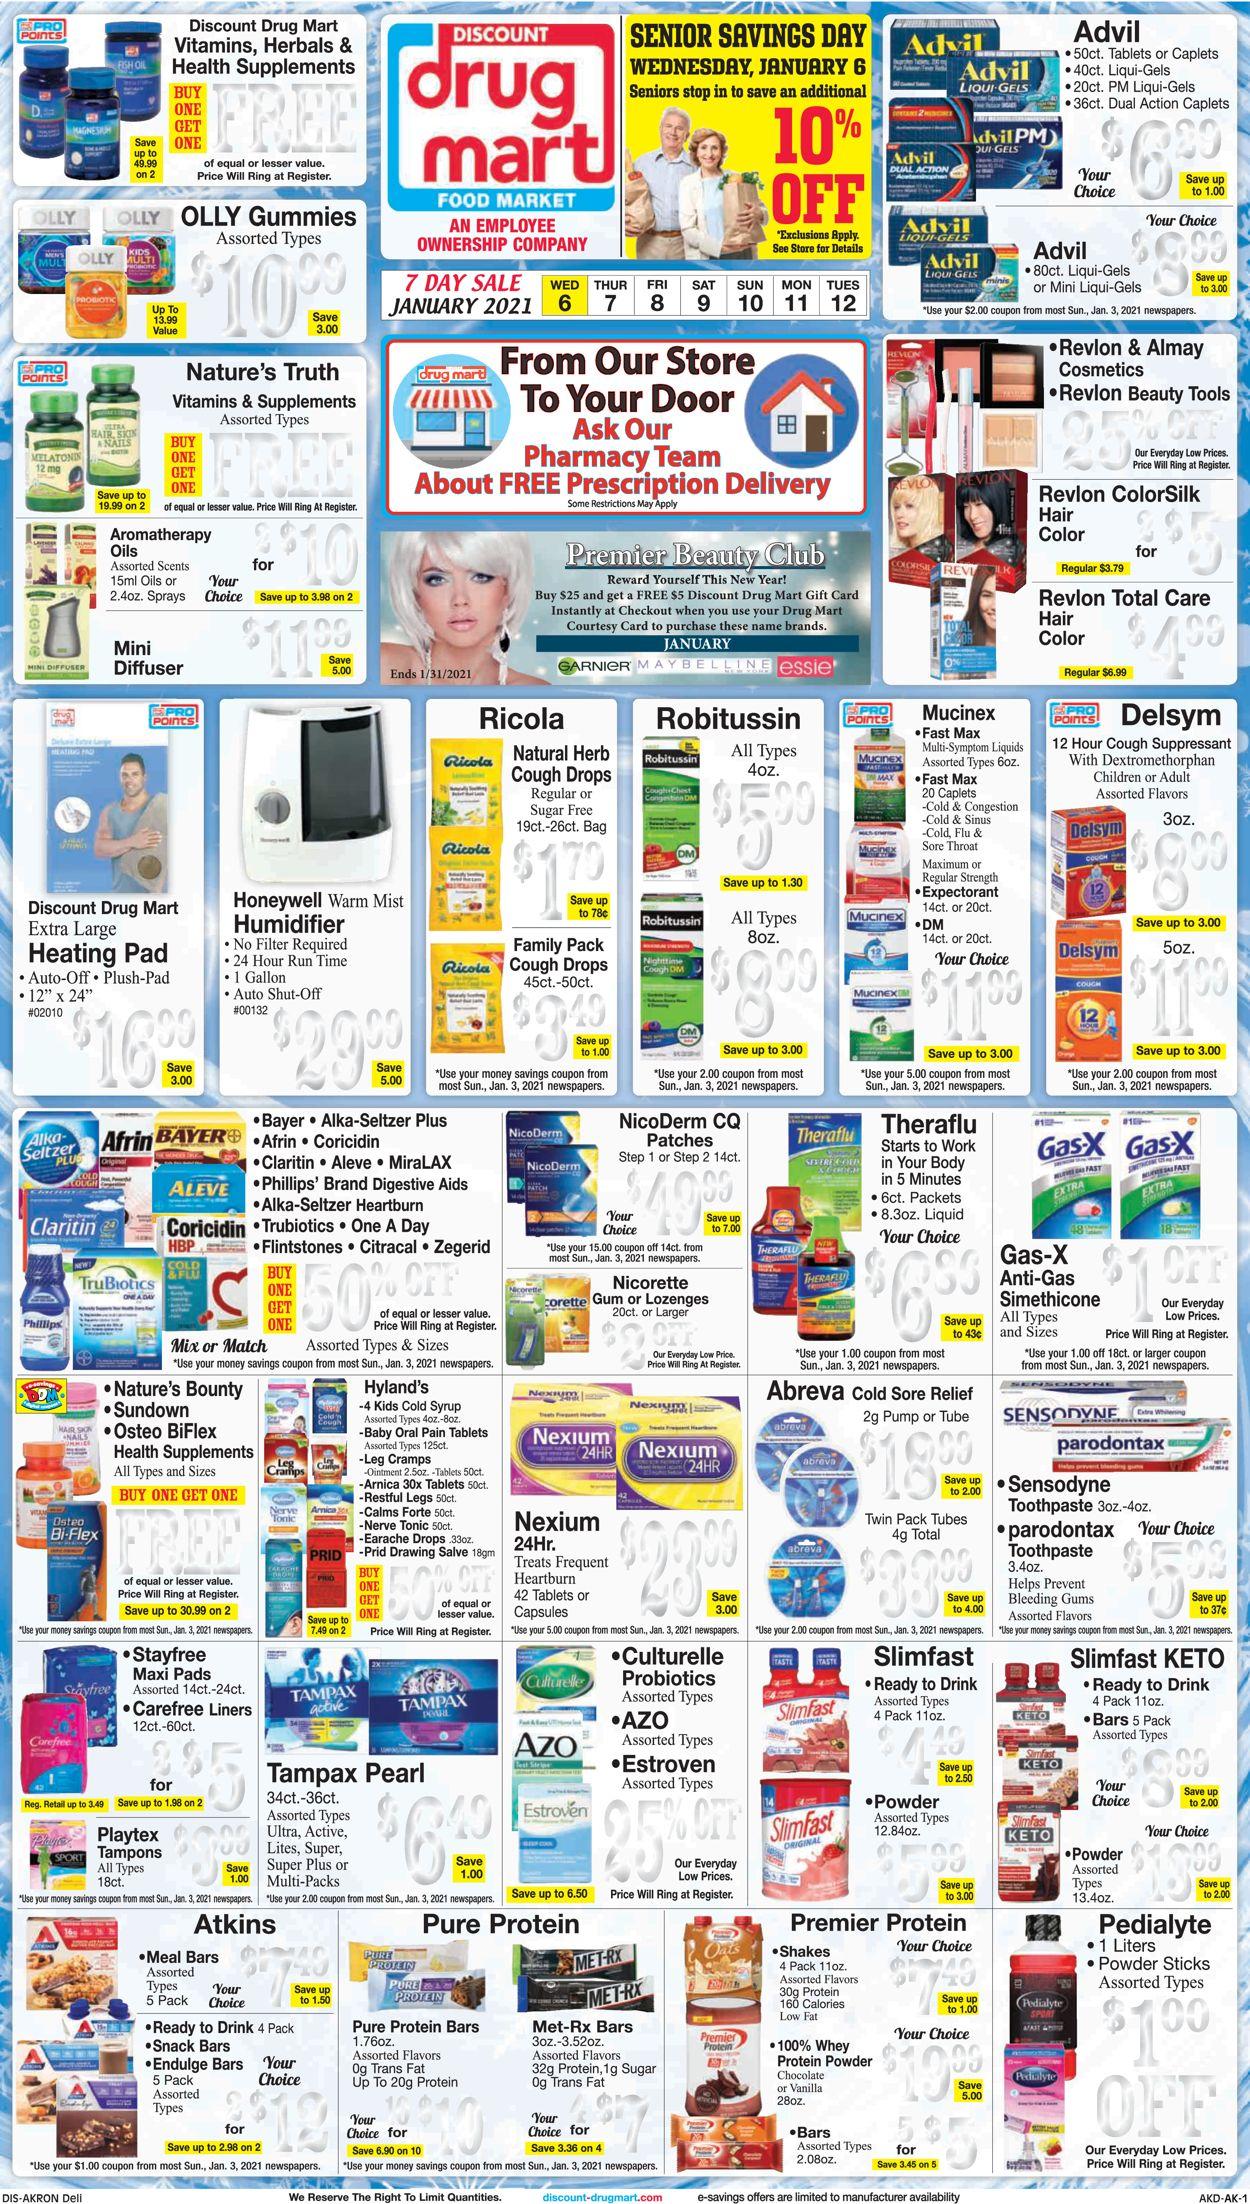 Discount Drug Mart Weekly Ad Circular - valid 01/06-01/12/2021